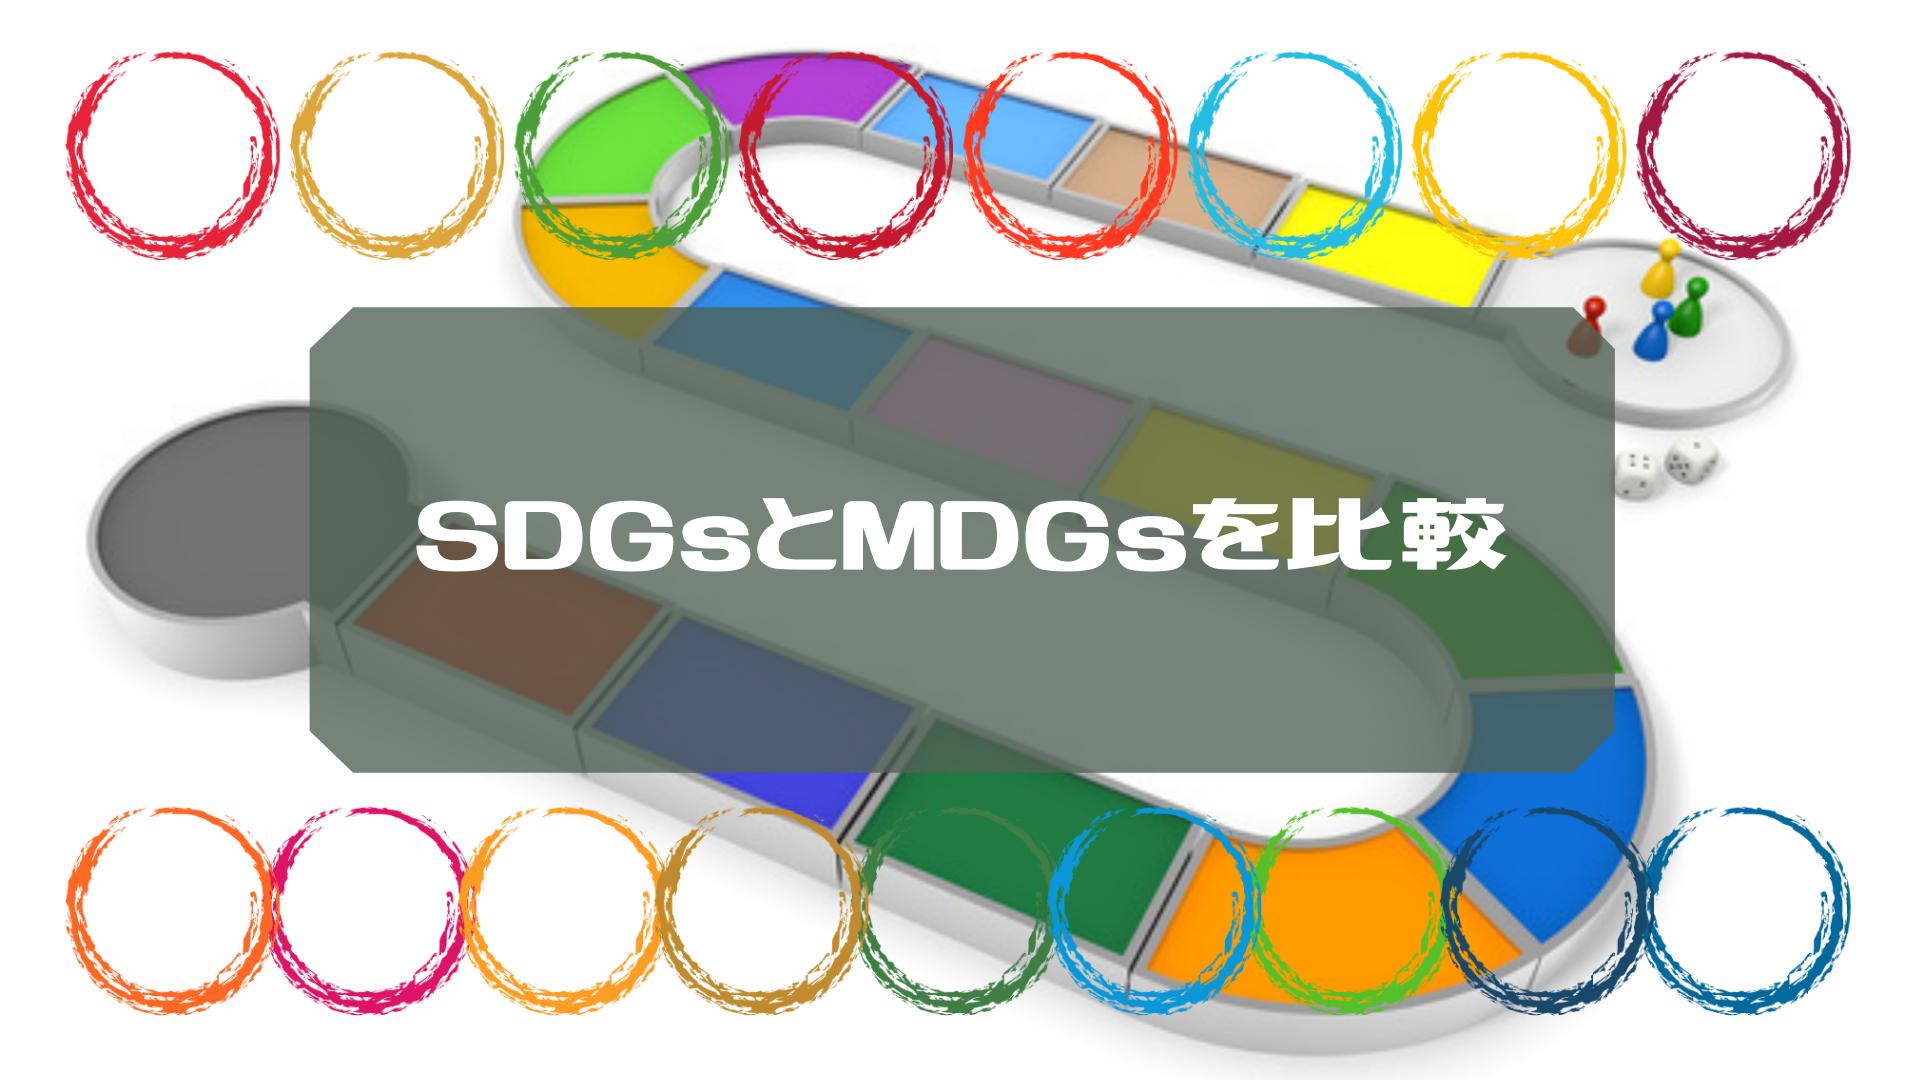 SDGs(持続開発な開発目標)とMDGs(ミレニアム開発目標)を比較!